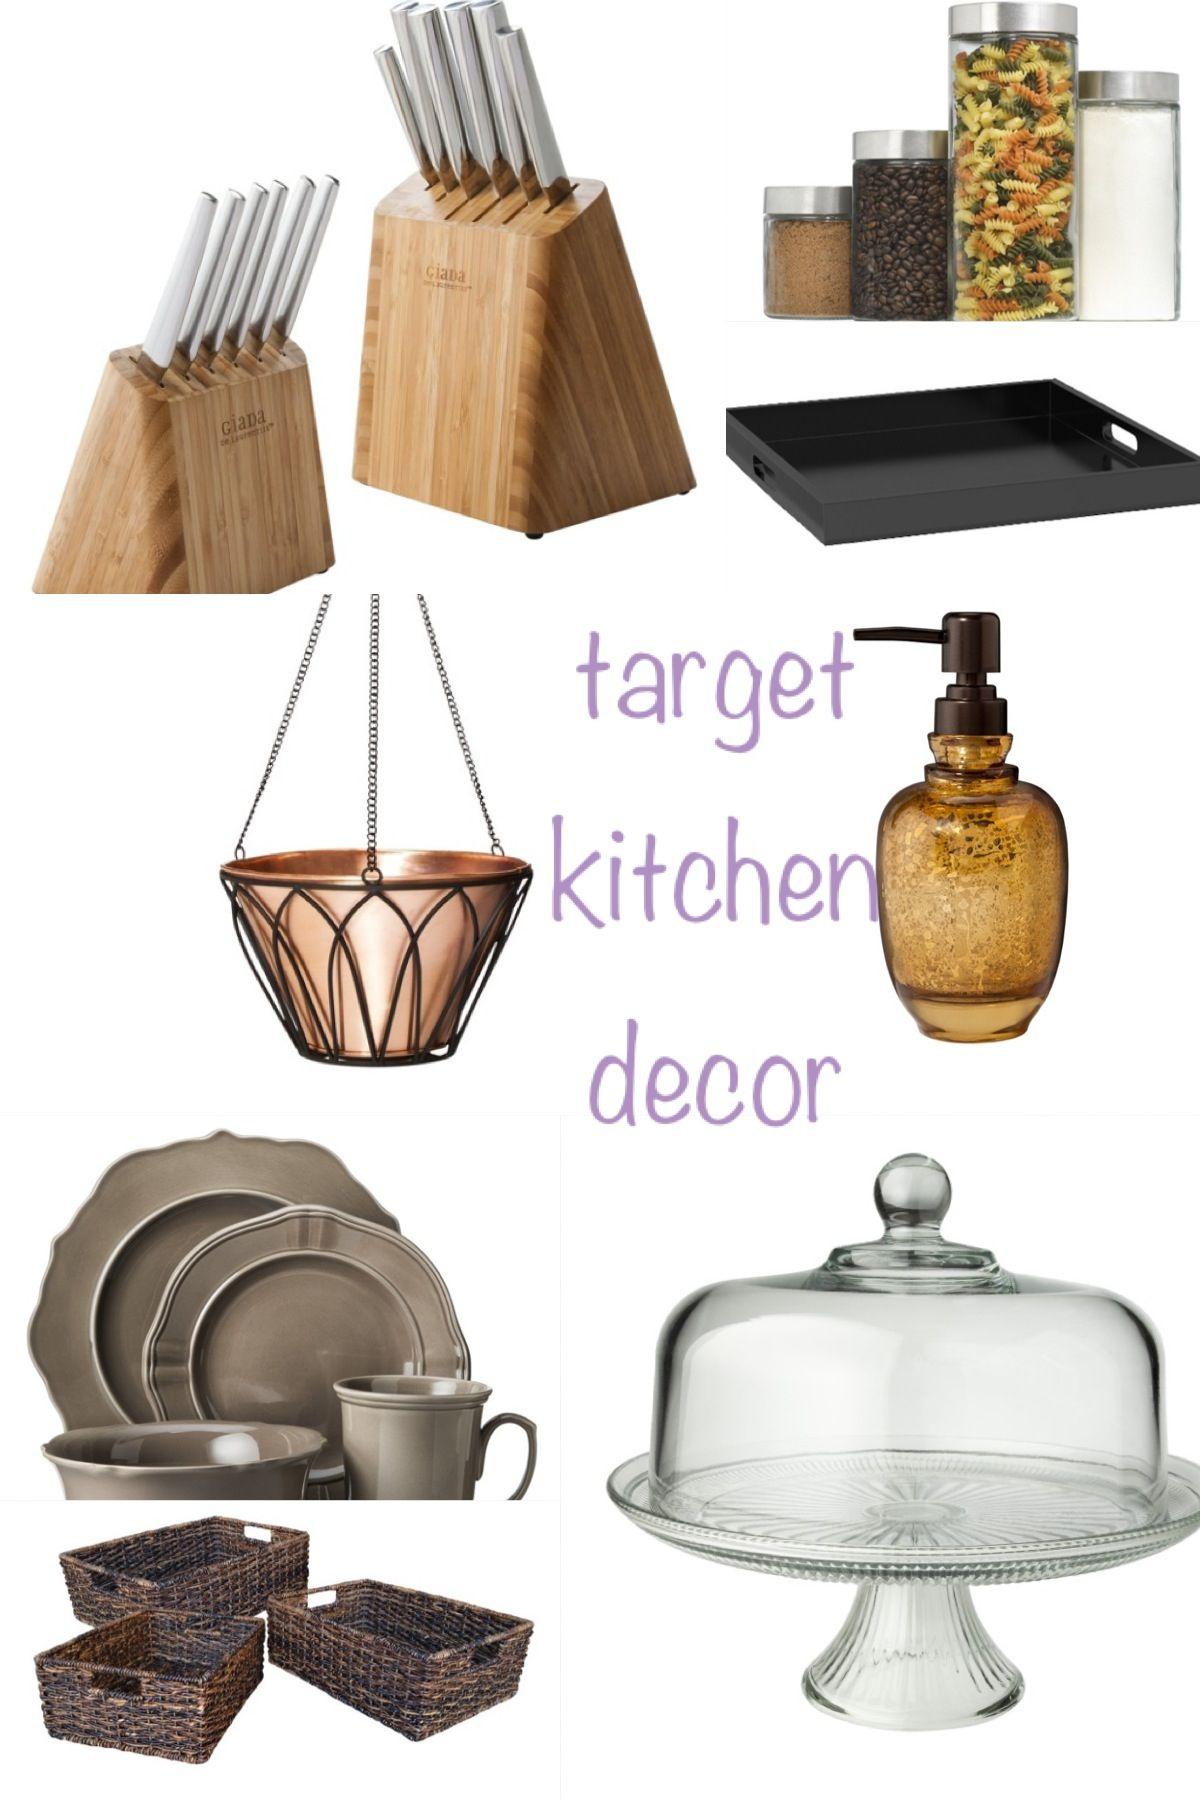 Target Kitchen Decor Kitchen Decor Target Kitchen Decor Target Kitchen